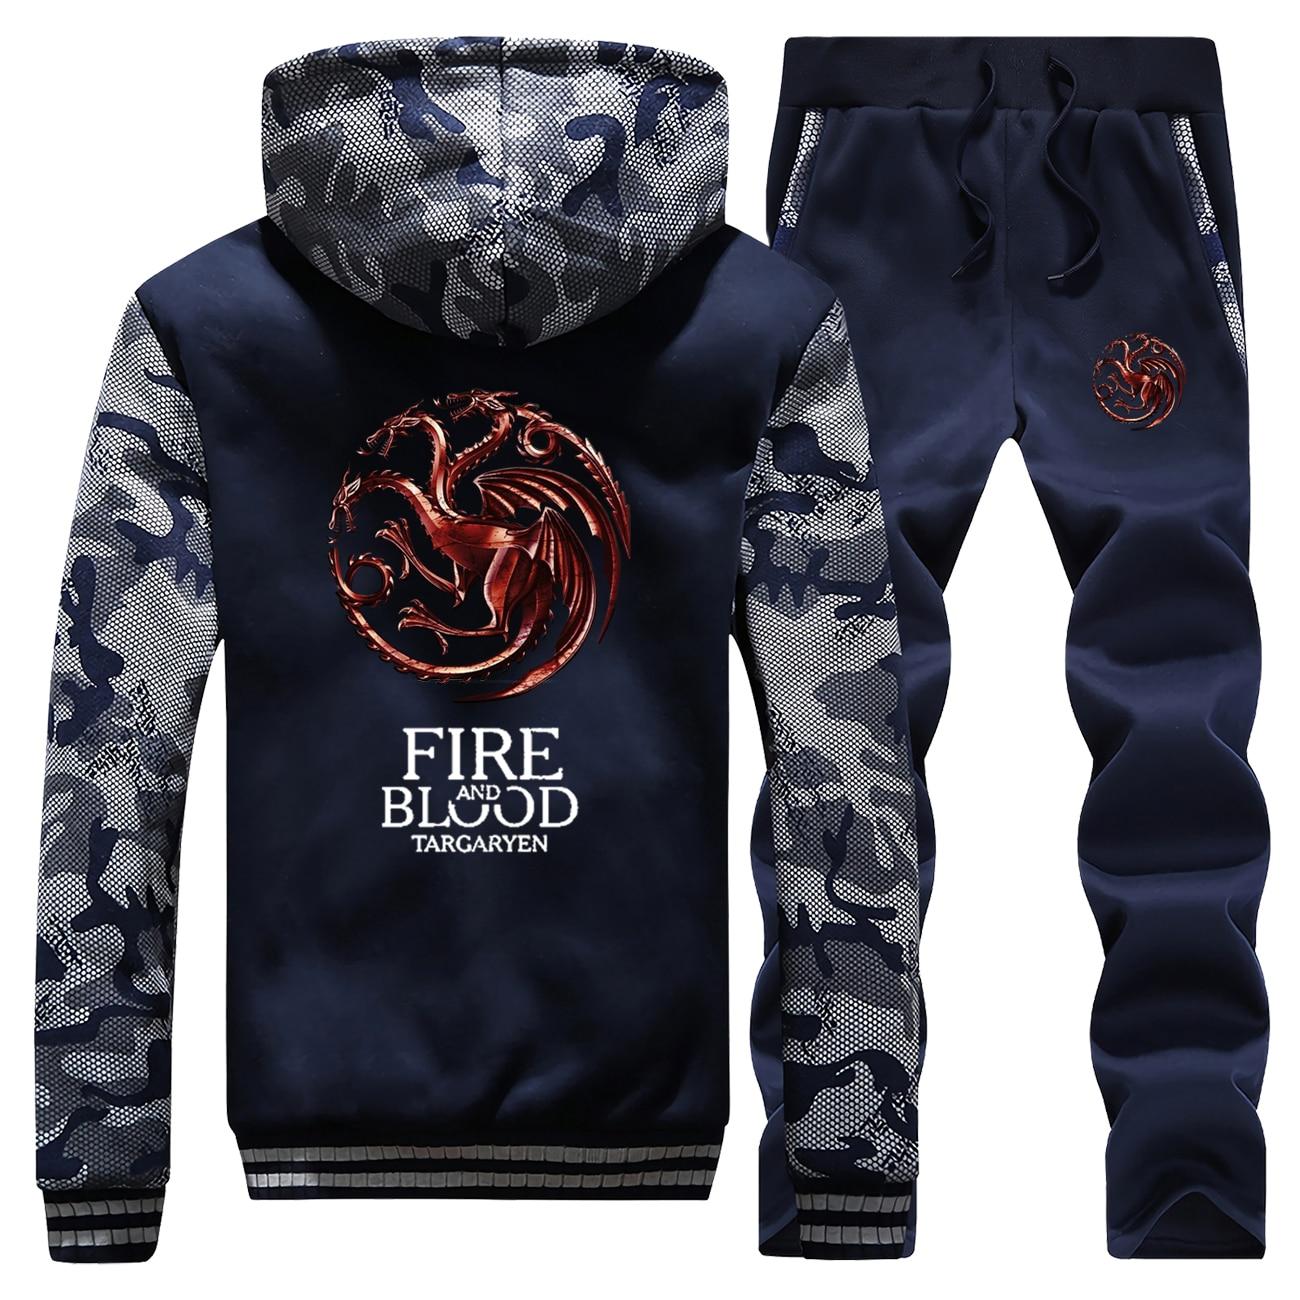 Game Of Thrones Thick Fleece Hoodie Sweatshirts Men Jacket+Pants 2 Piece Set Mens Fire And Blood Targaryen Hoodies Trousers Suit